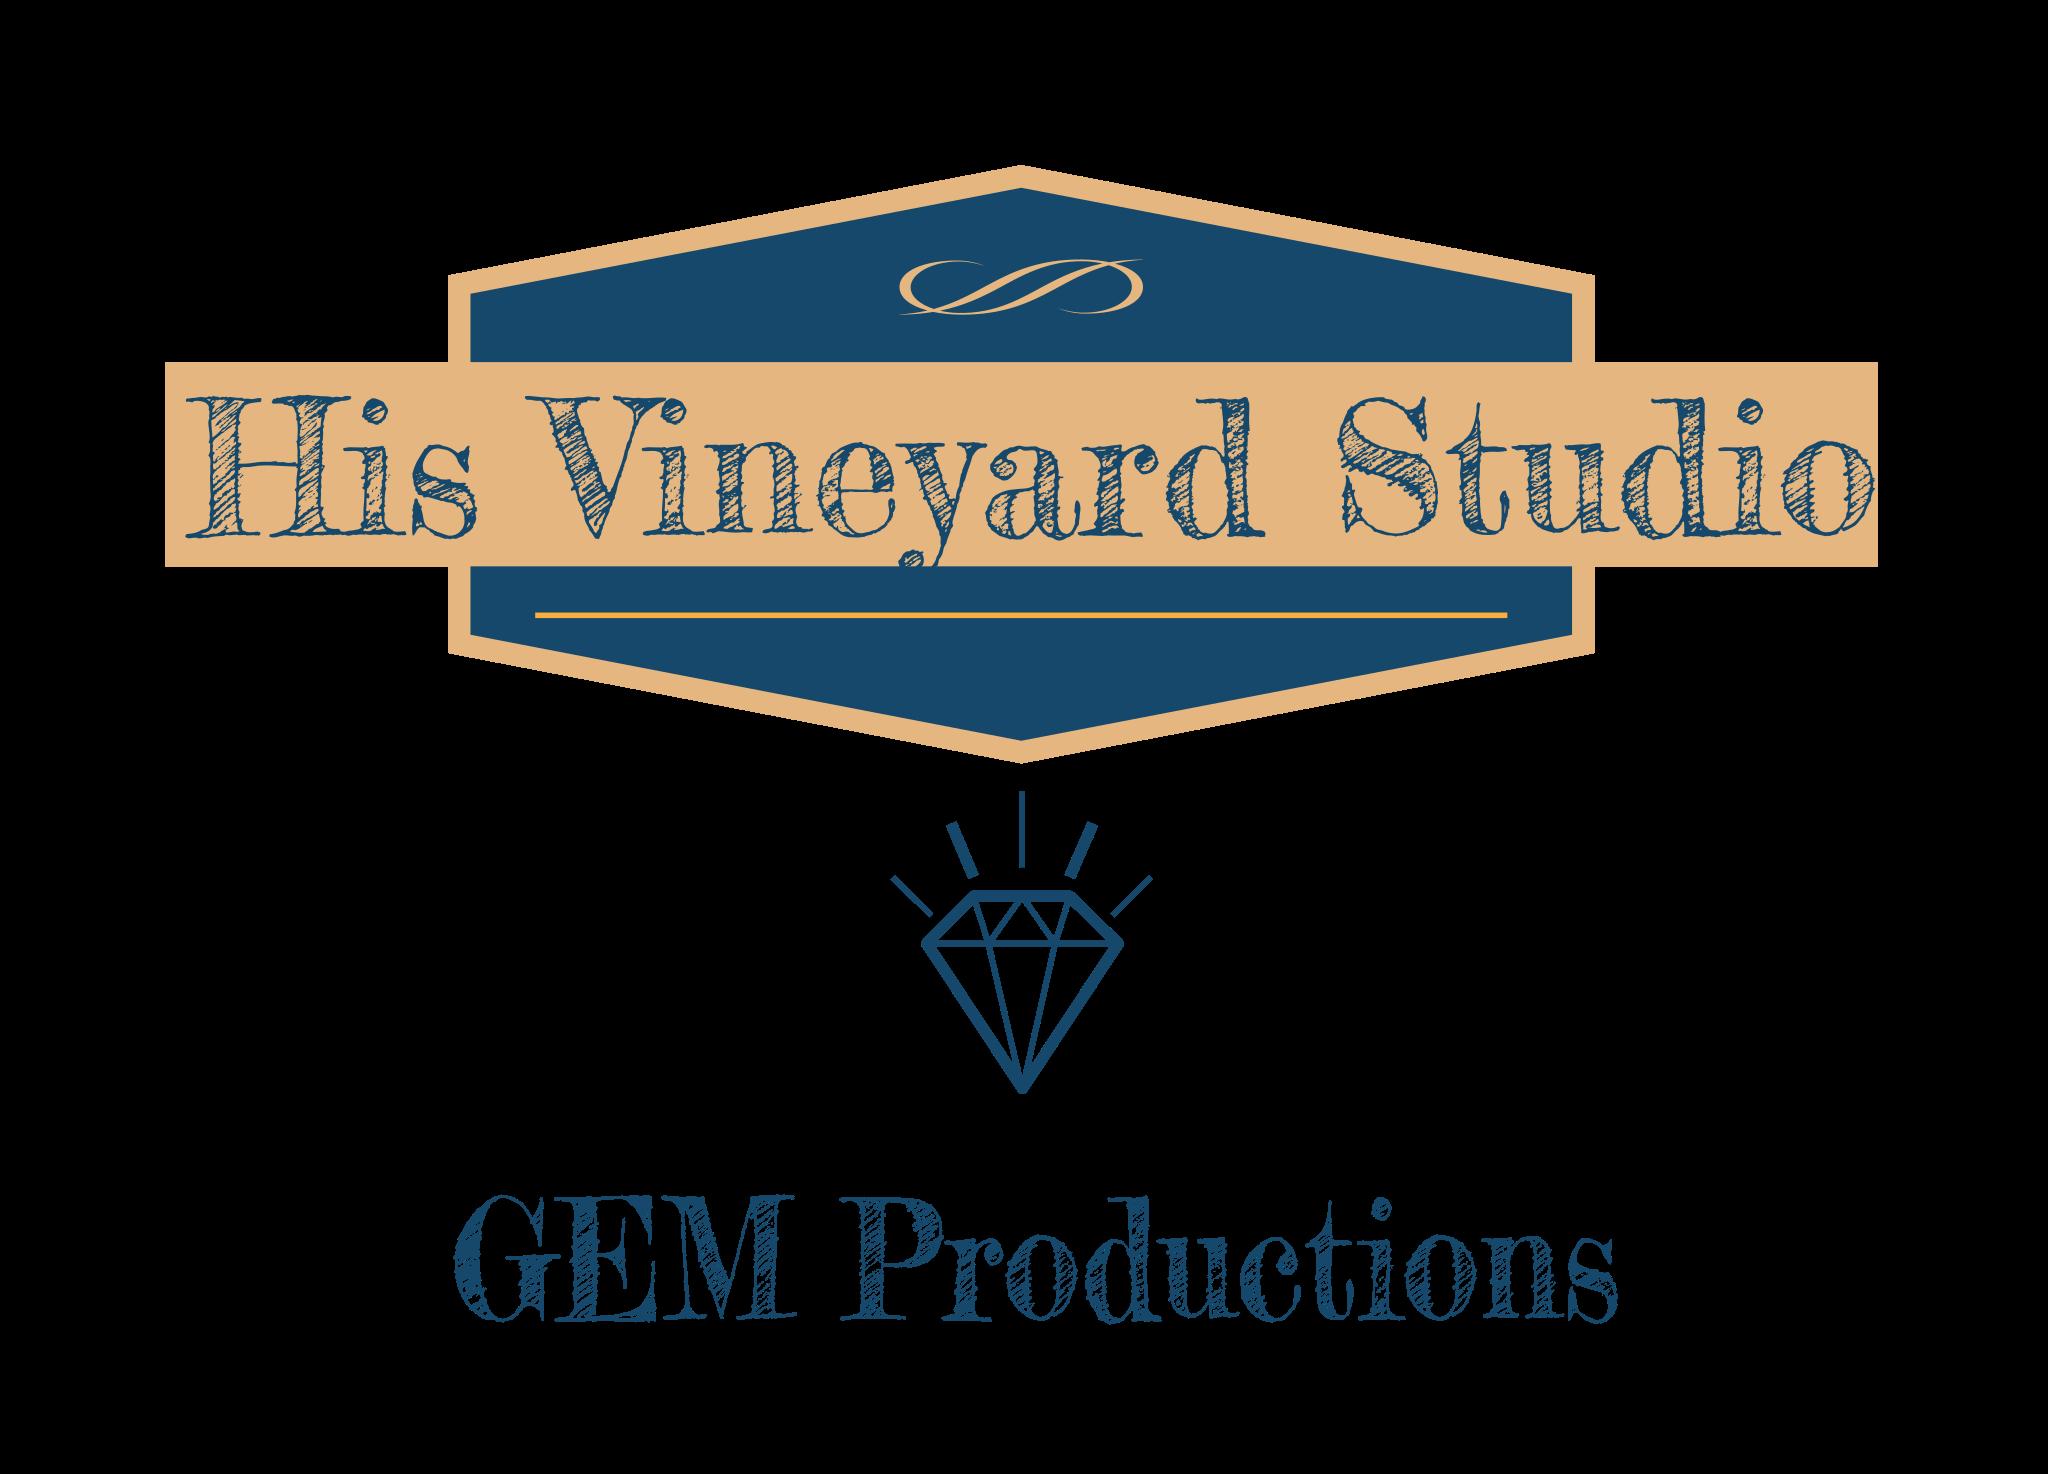 His Vineyard Studio